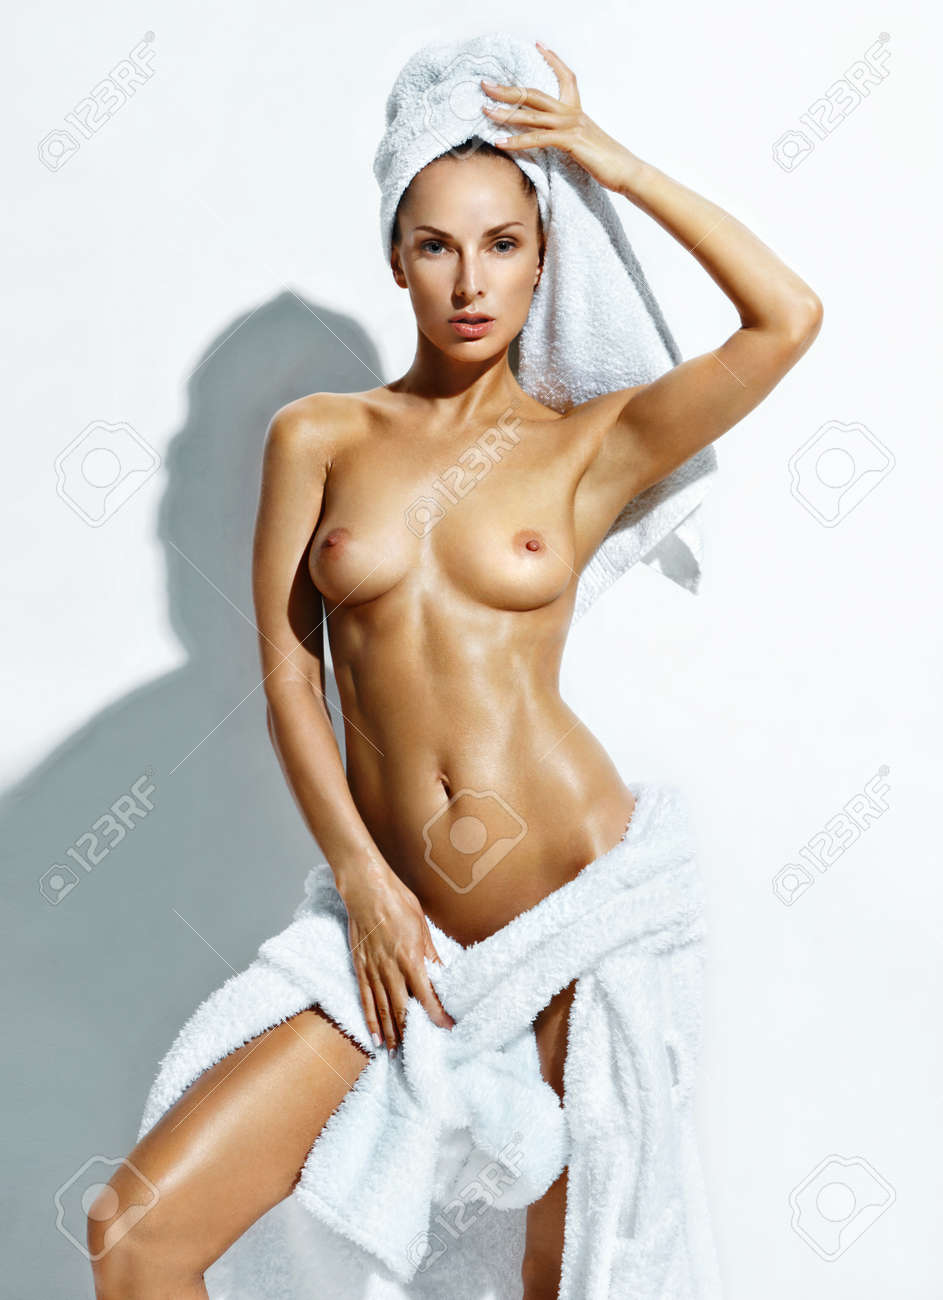 Slim and nude gallary